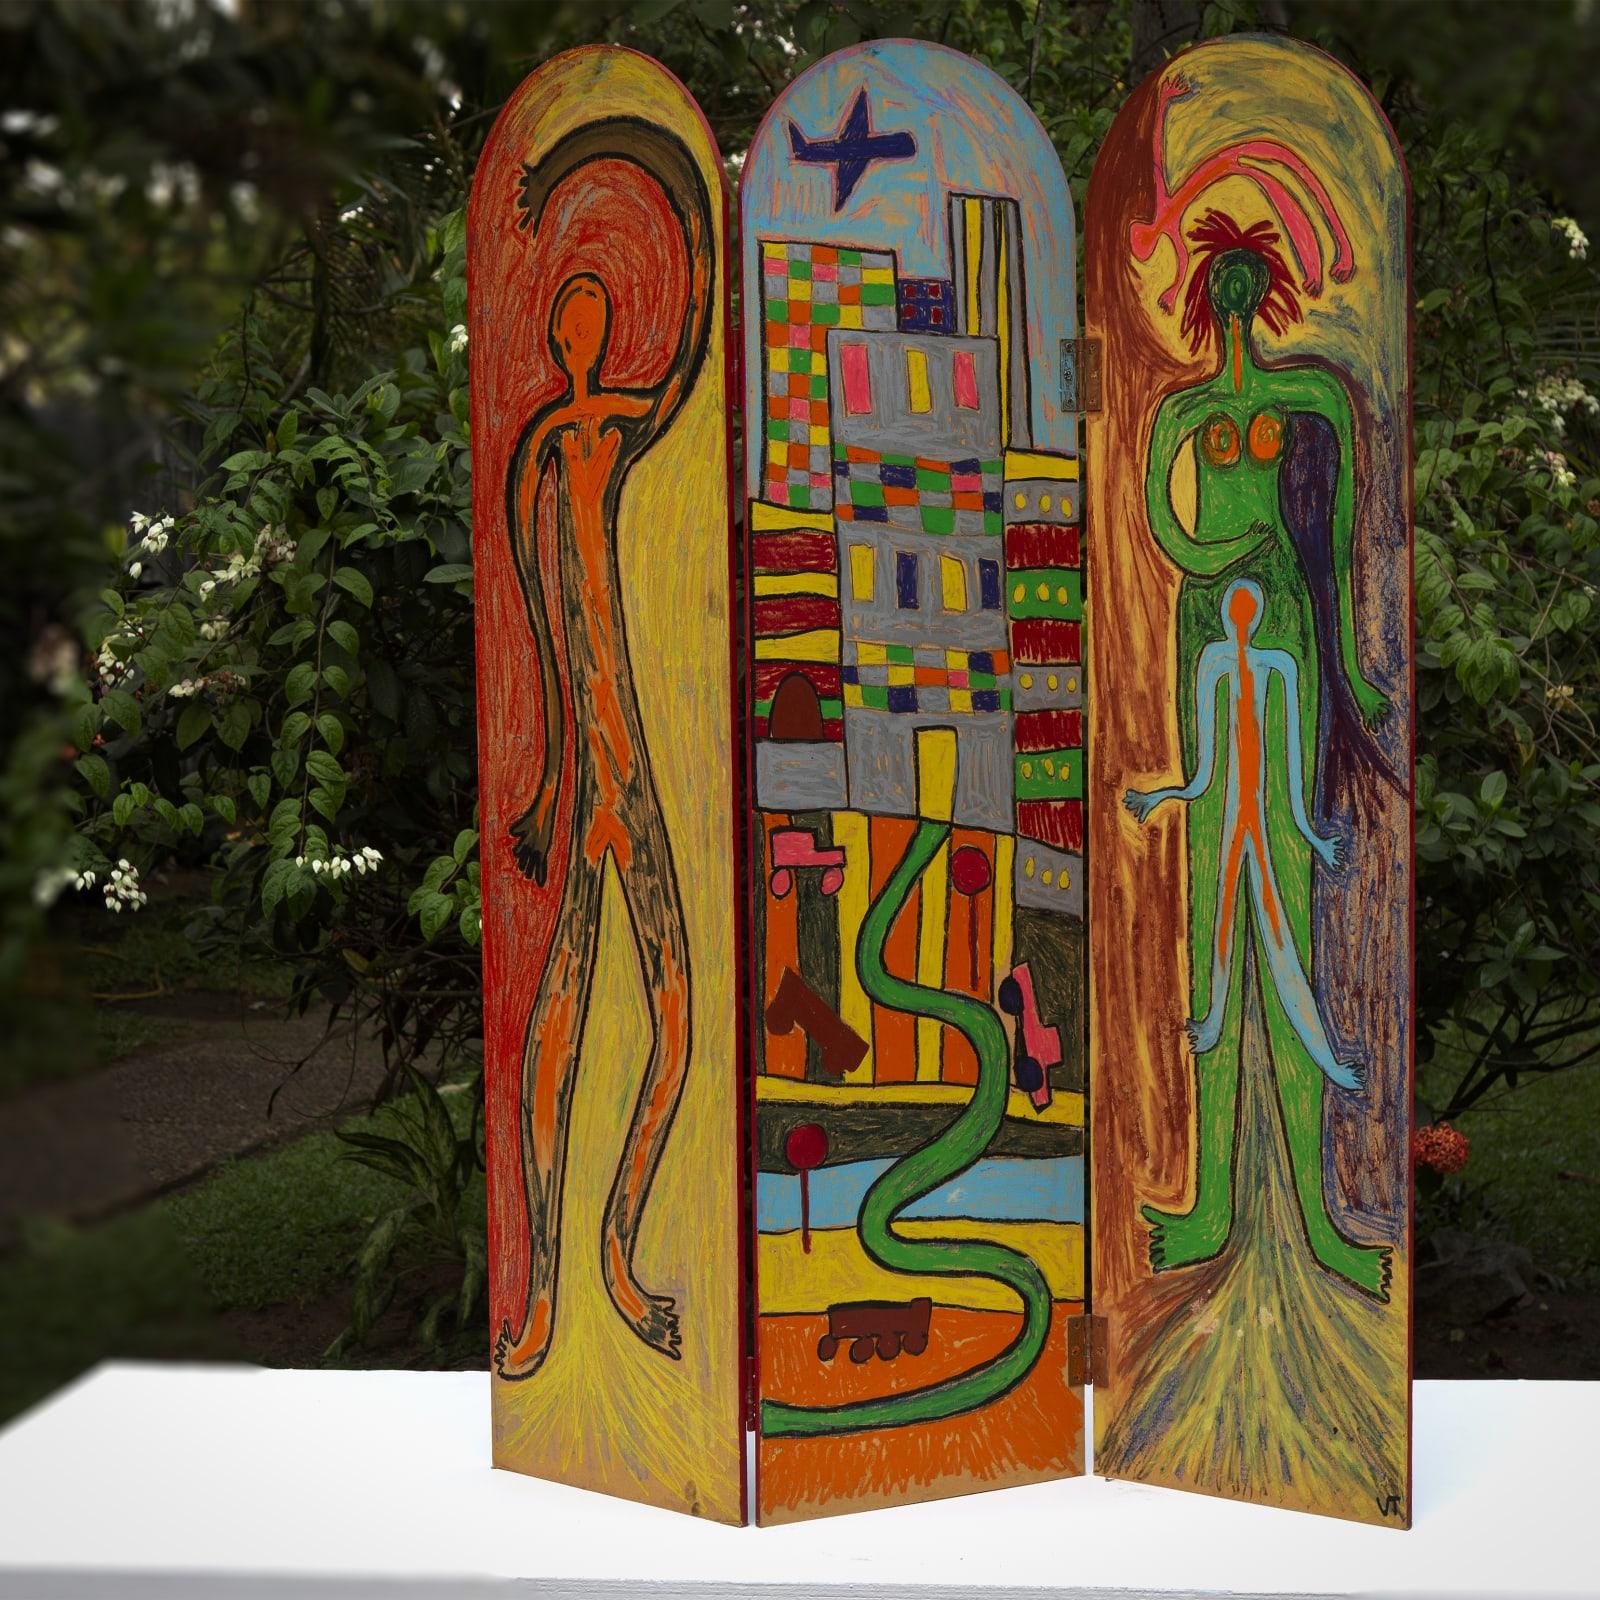 Véronique Tadjo  Cycle de vie , 2002  Oil on wood  123 x 104 cm  48 3/8 x 41 in